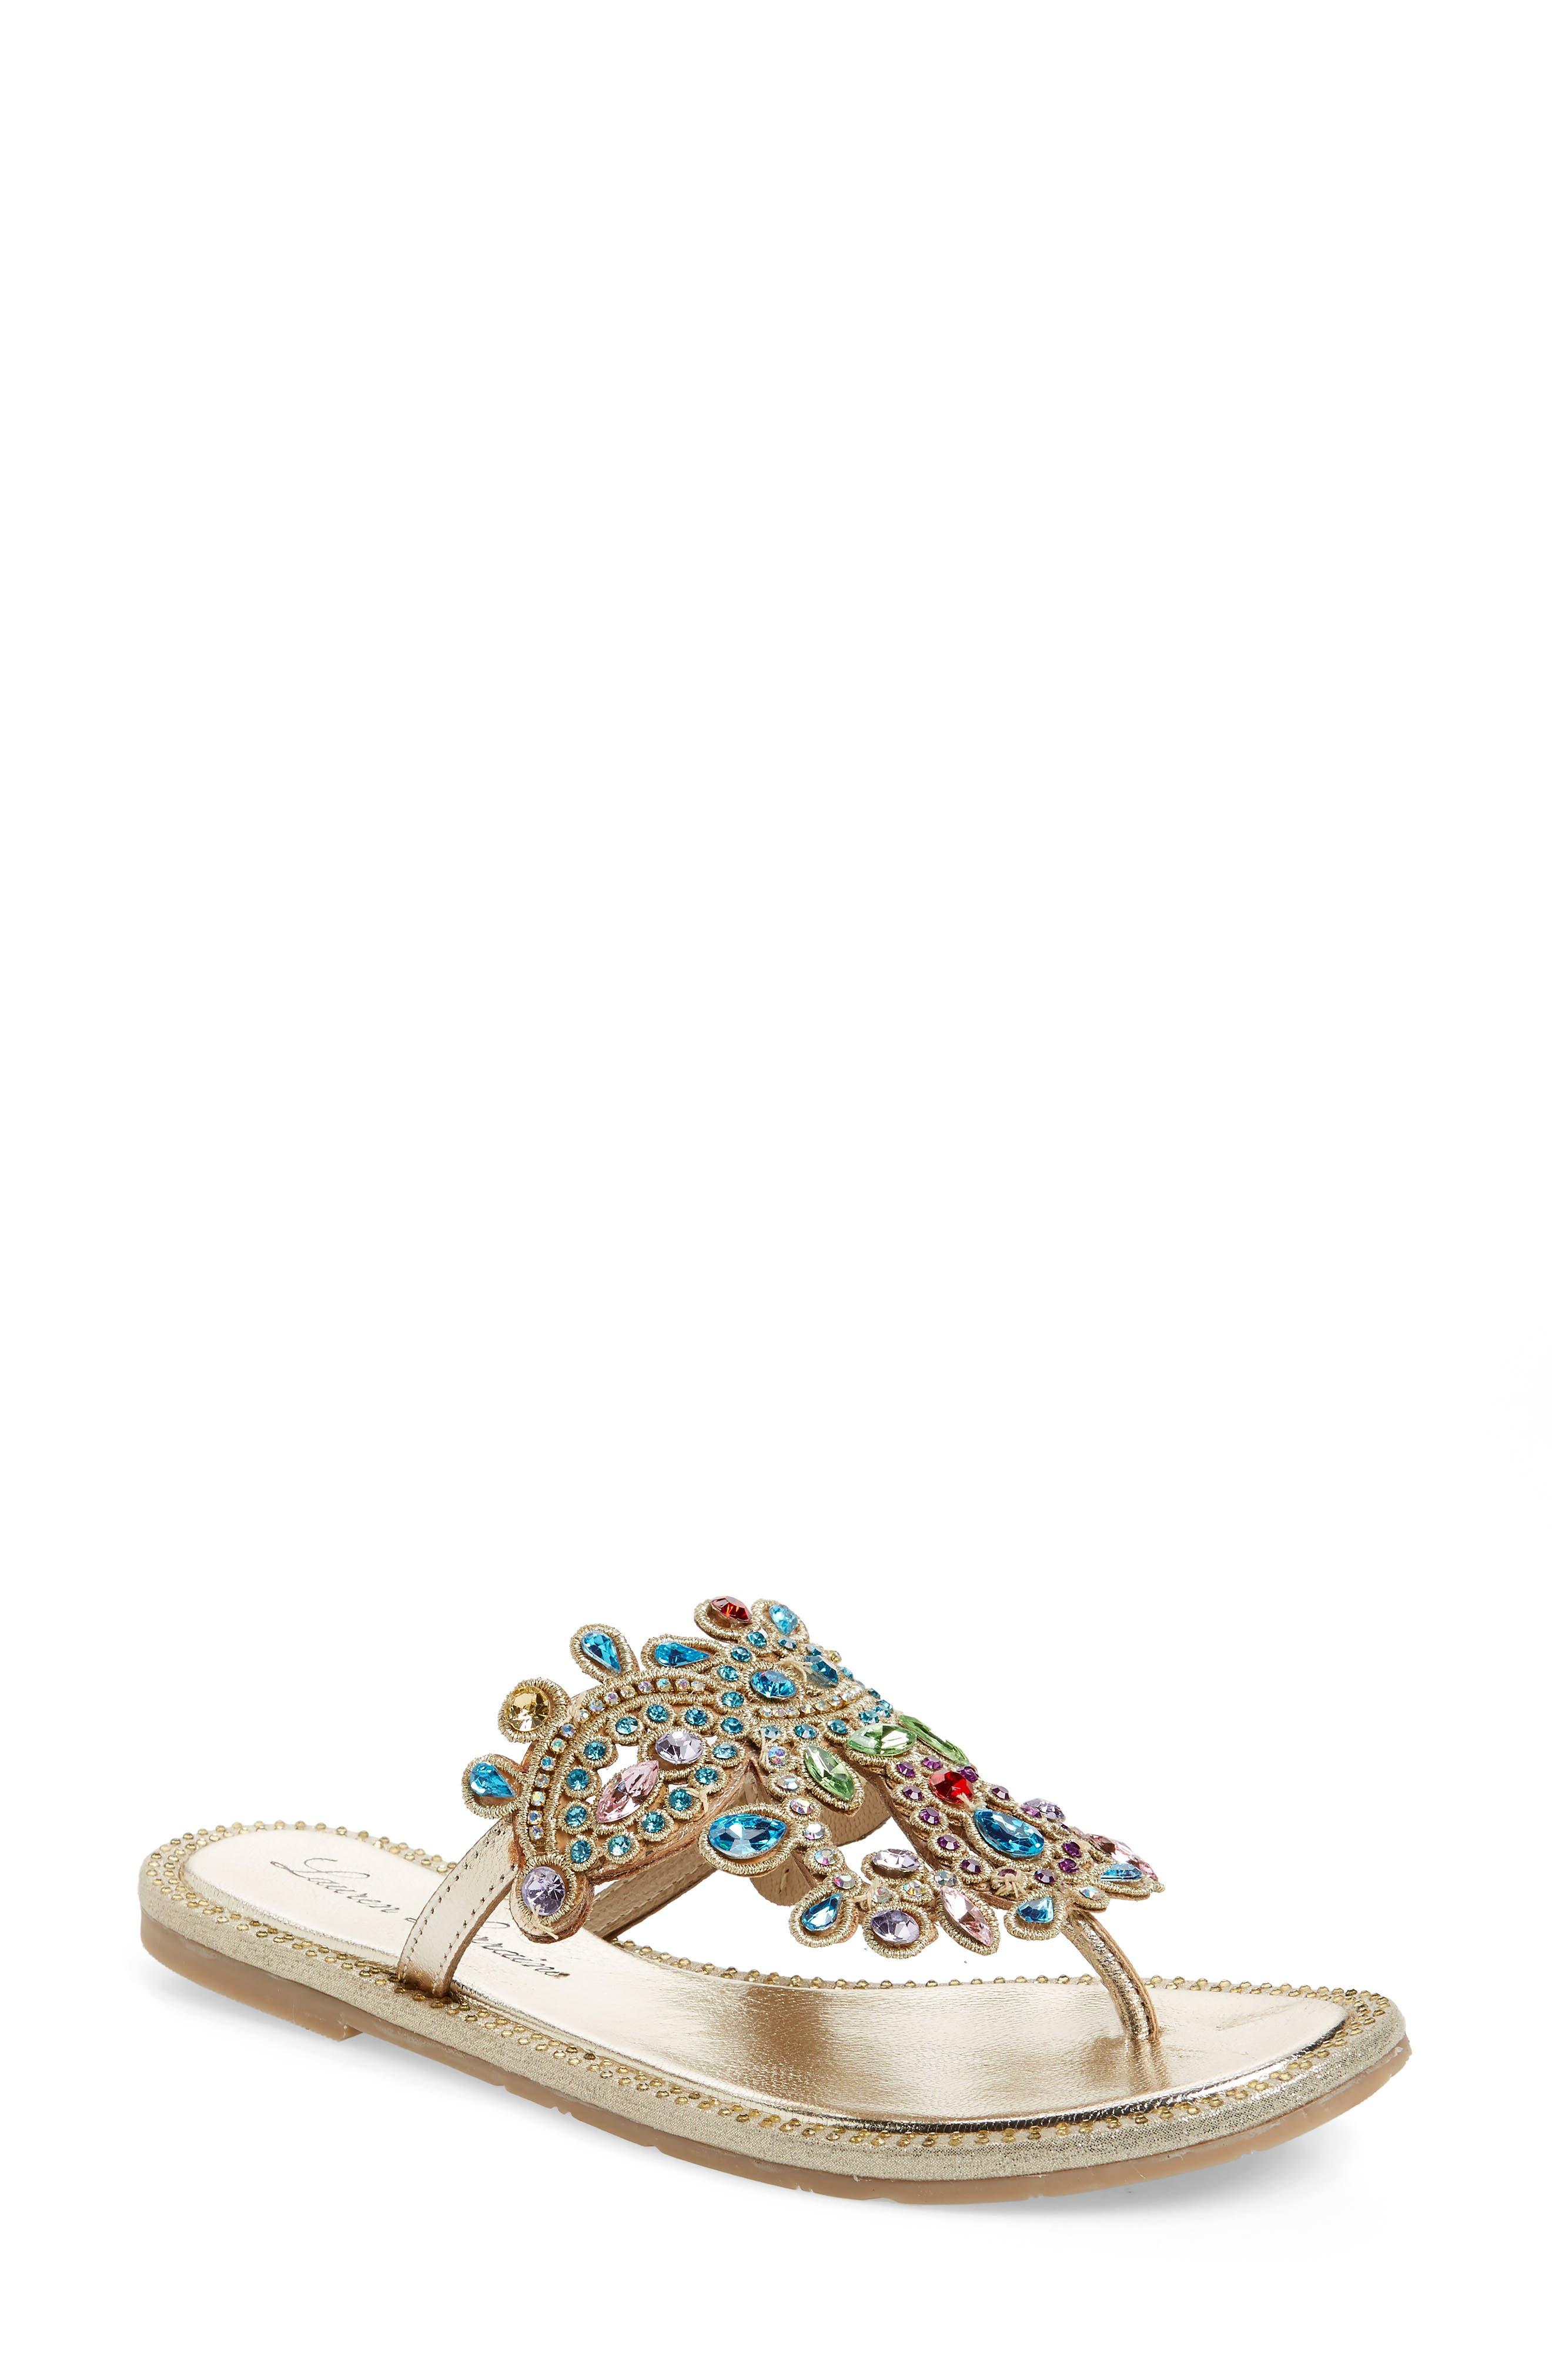 Lauren Lorraine St. Tropez Sandal- Metallic